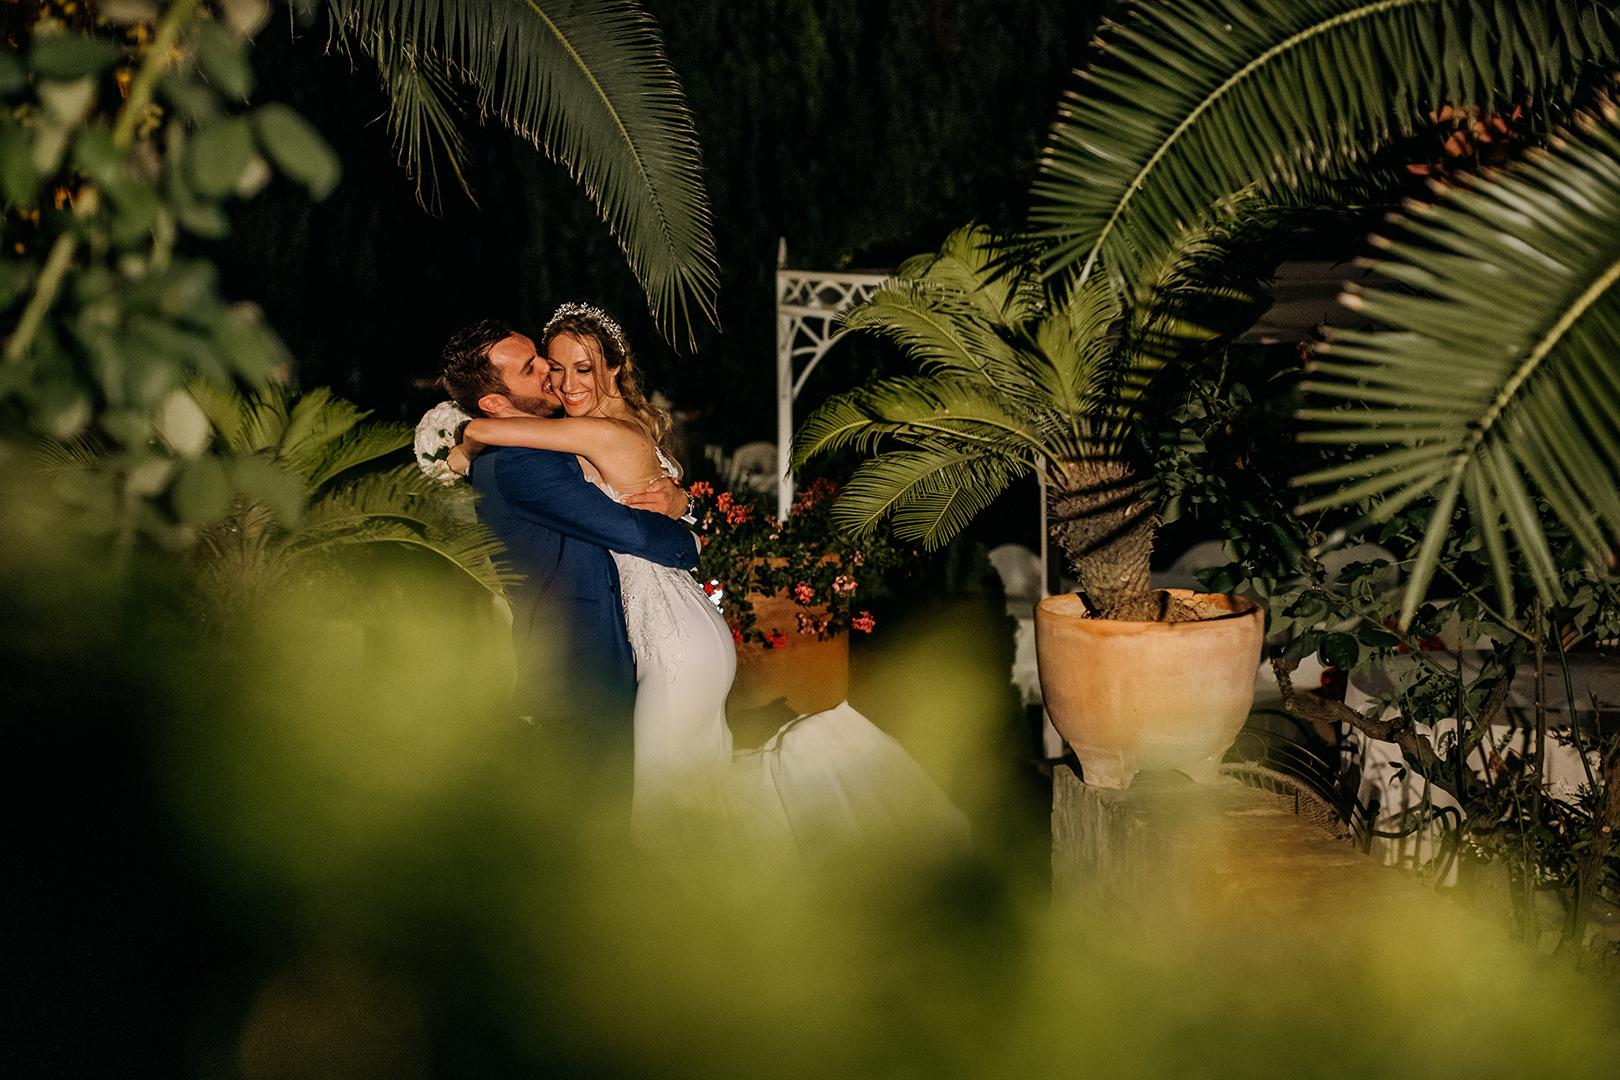 65 gianni-lepore-fotografo-matrimonio-wedding-sposi-bride-groom-ritratto